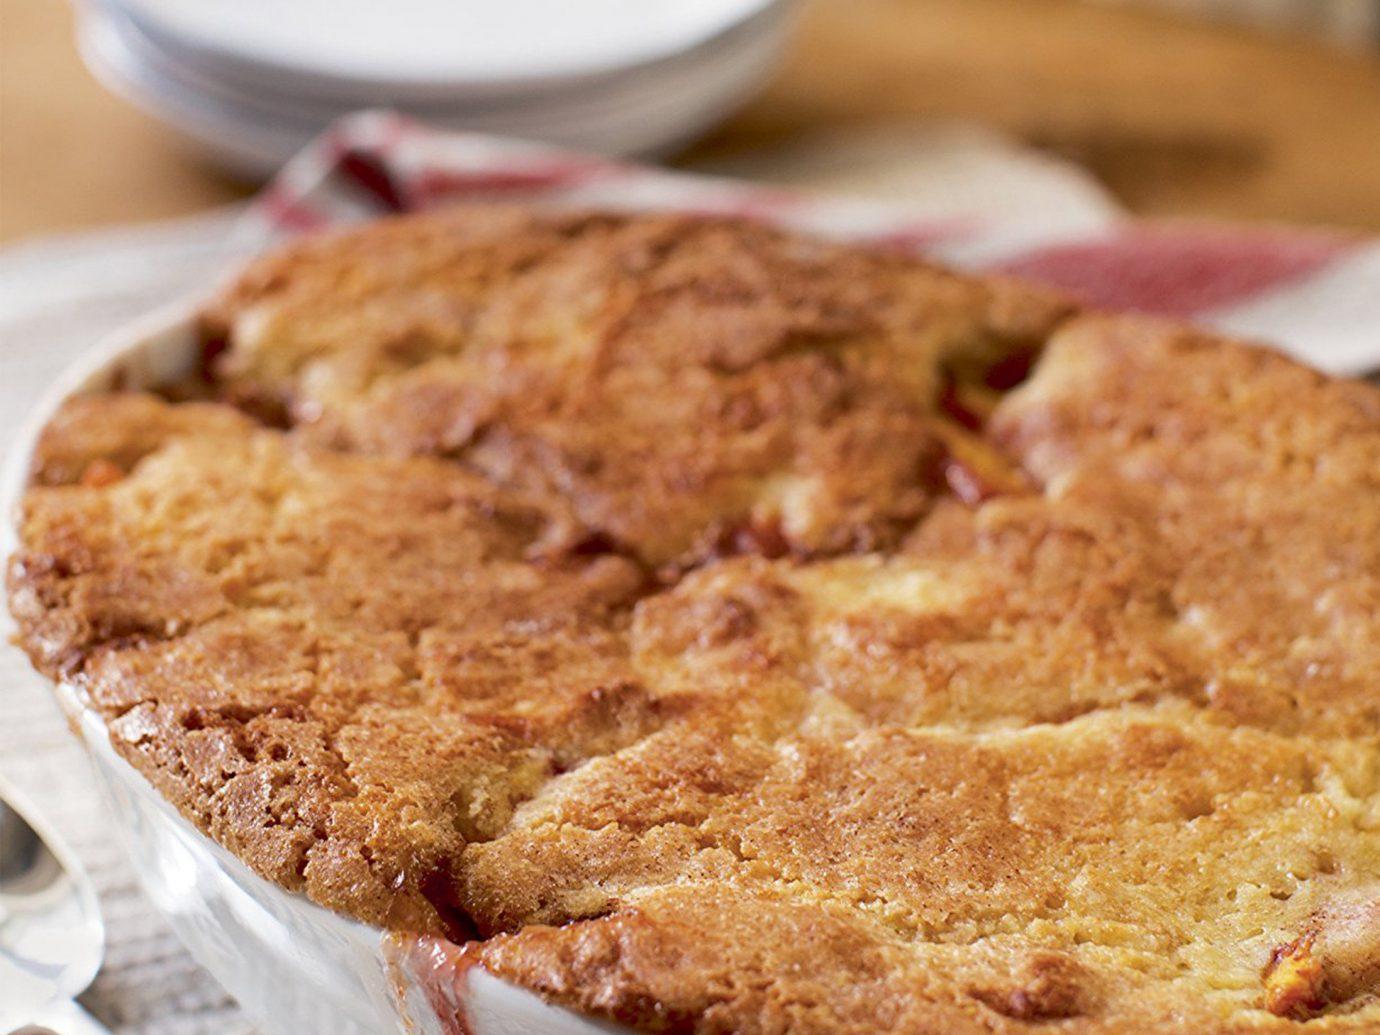 Food + Drink food plate indoor dish dessert piece baked goods breakfast meal produce slice pie fruit baking flavor flowering plant